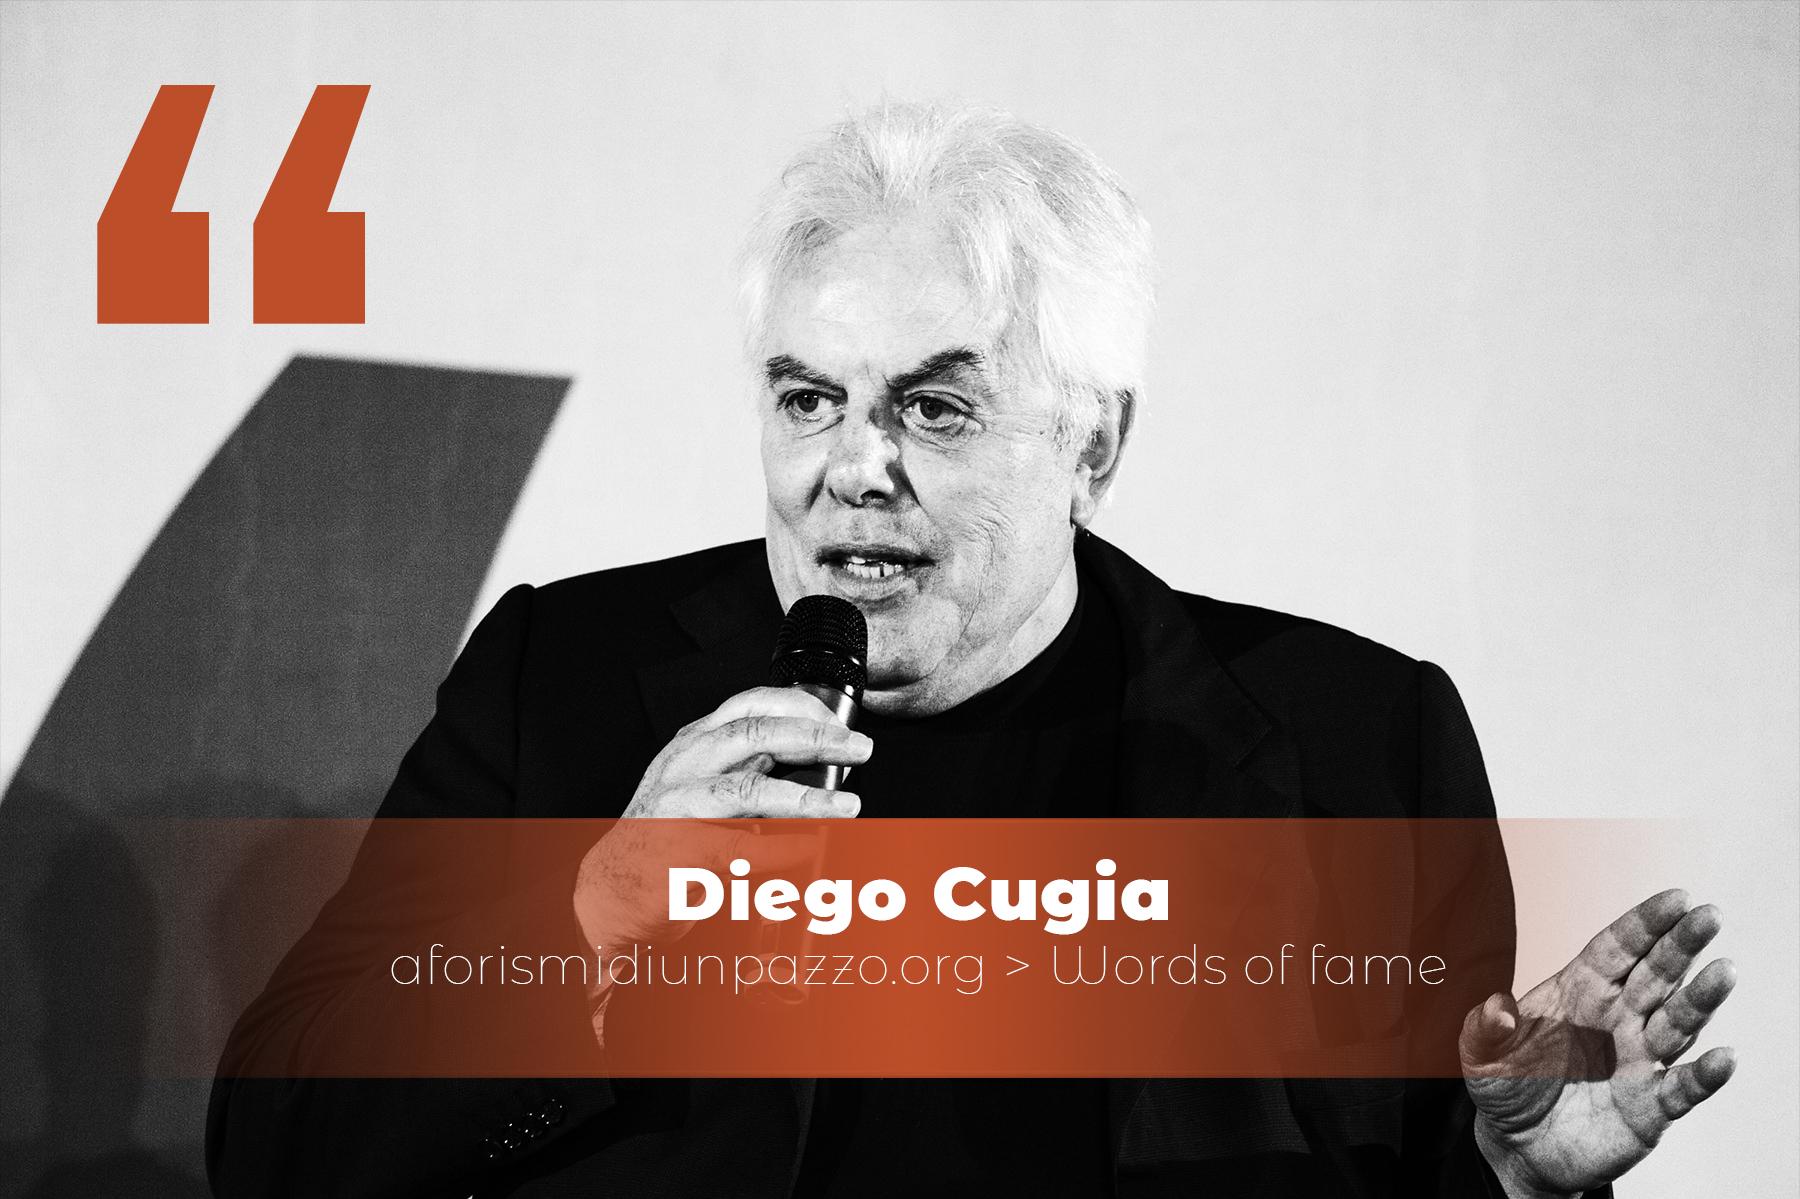 Diego Cugia